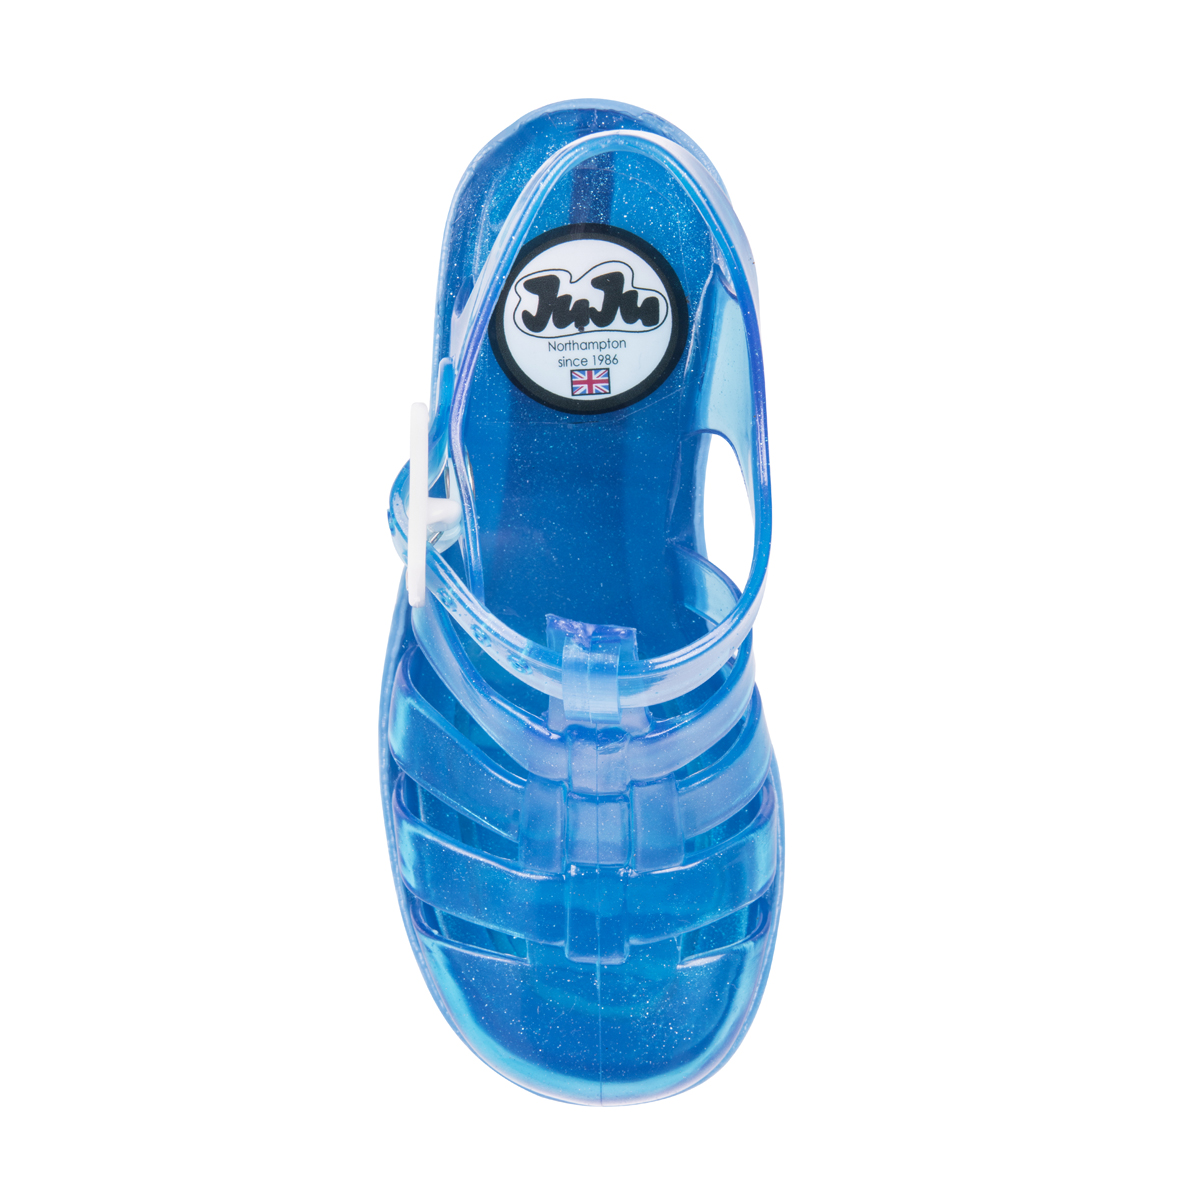 BABE JNR DENIM BLUE SPARKLES.DENIM BLUE LR #2.jpg